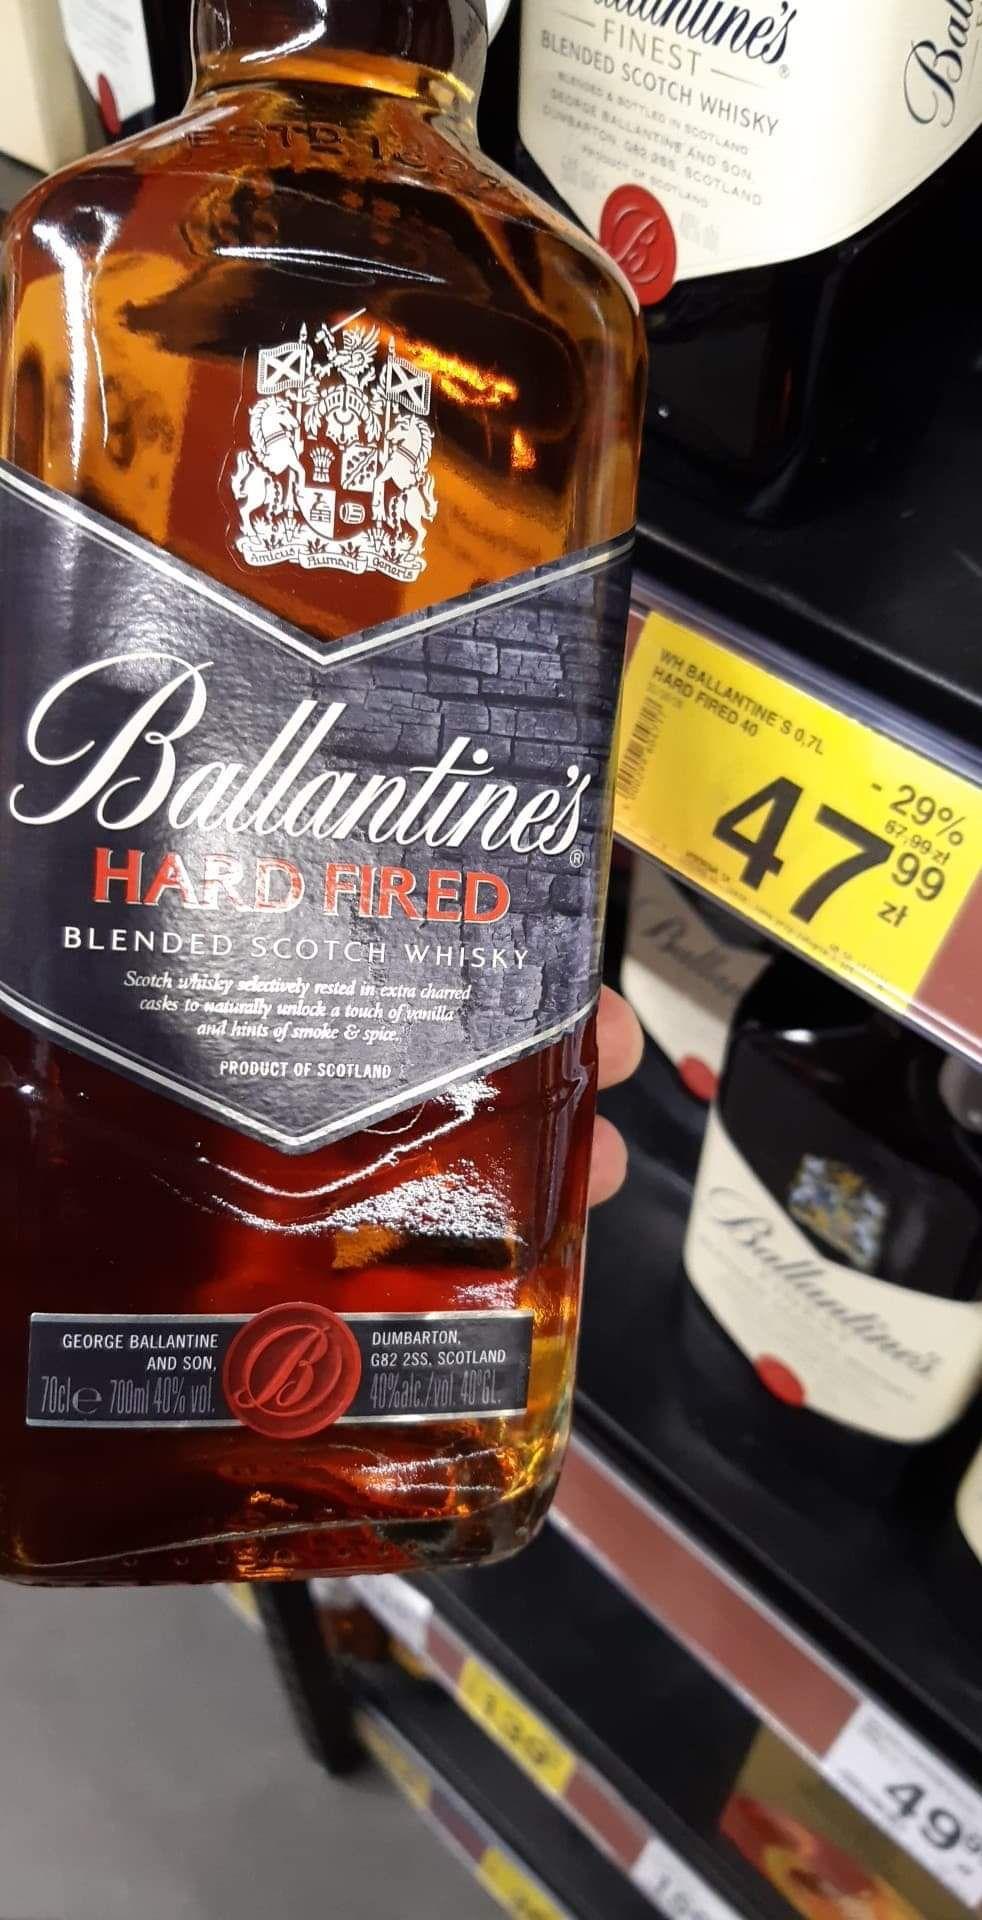 Whisky ballantine's  ( Ballantines ) hard fired